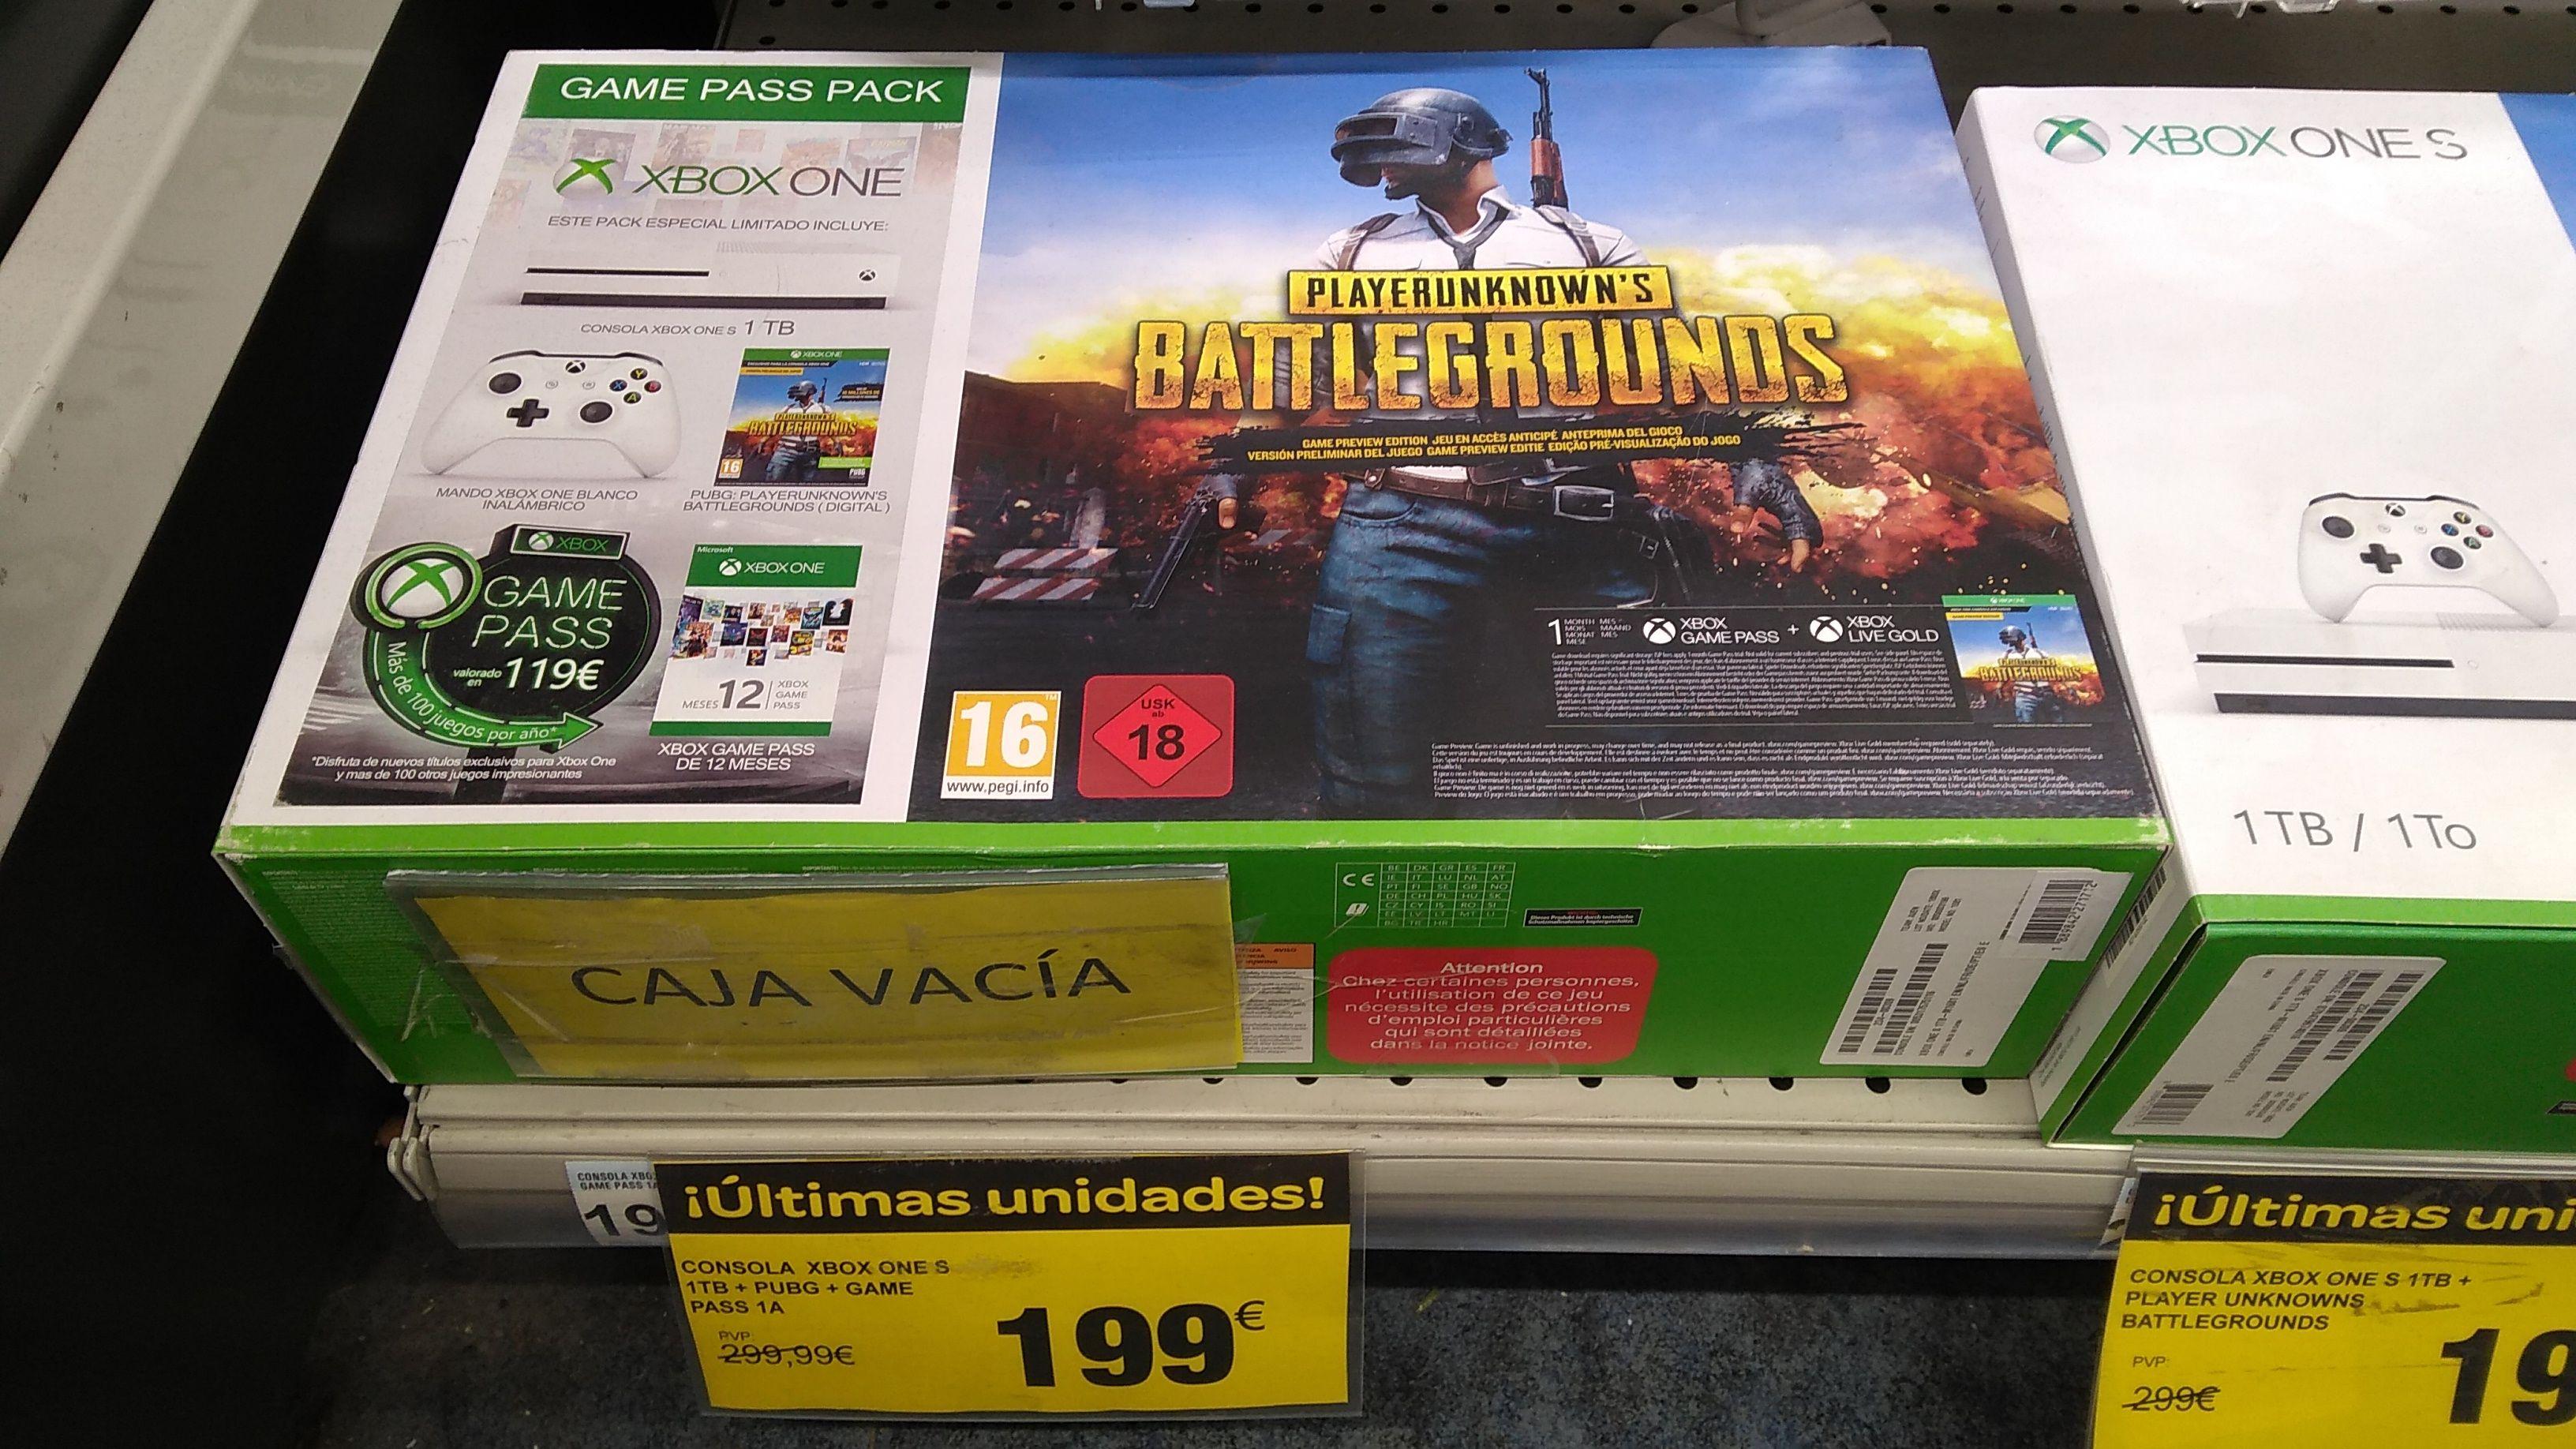 Xbox one s + mando + juego + 1 año Game pass (Carrefour Sestao en Vizcaya)